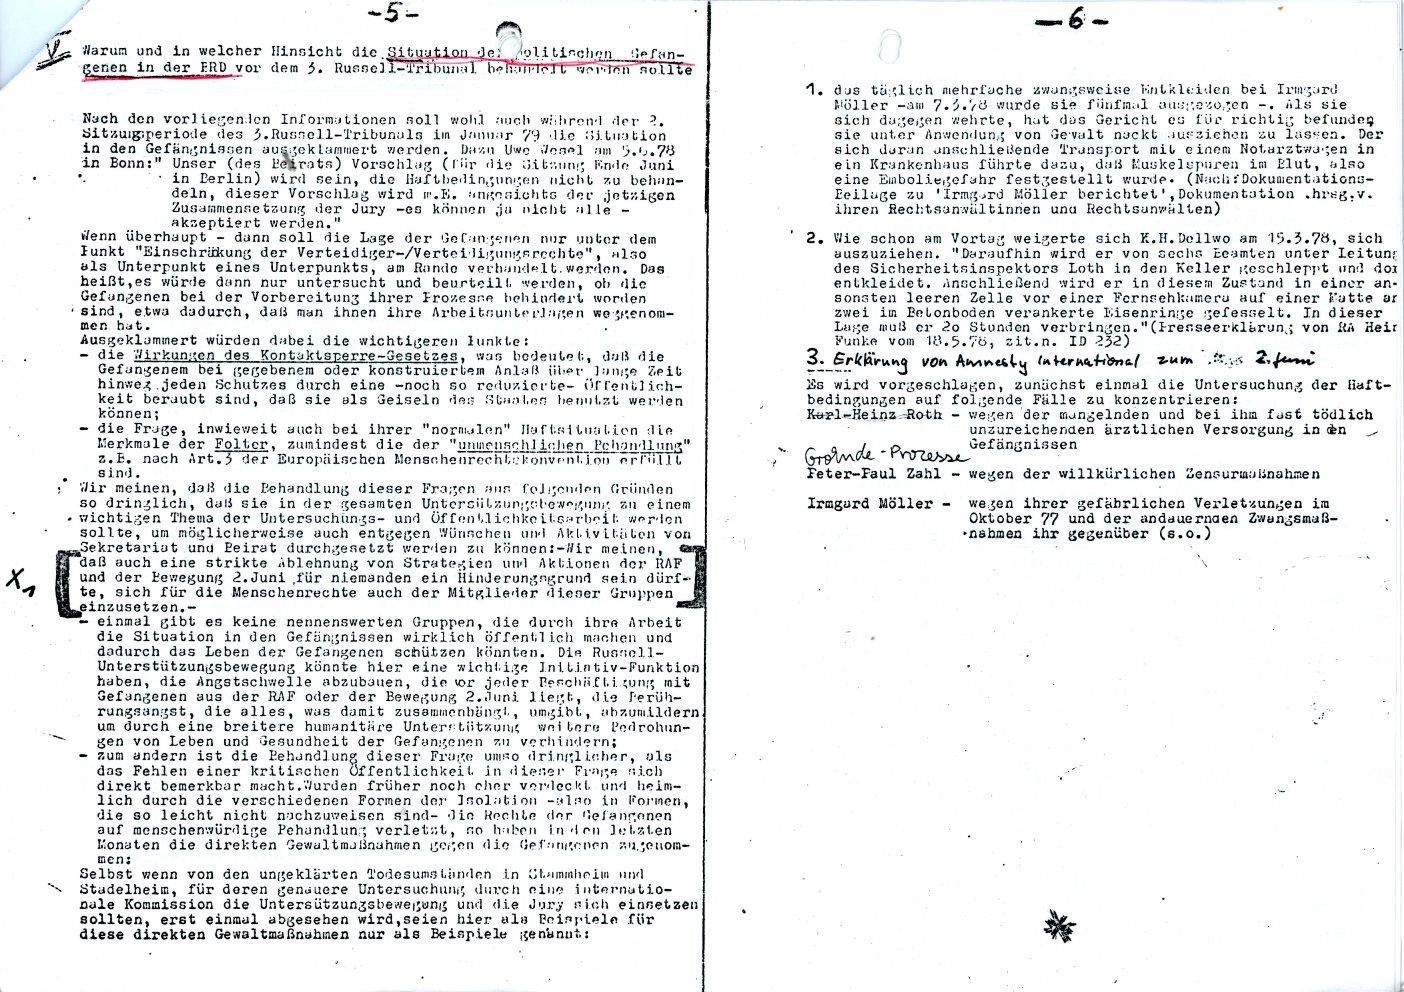 Koeln_Russell_Initiative_Dokumente_1978_06